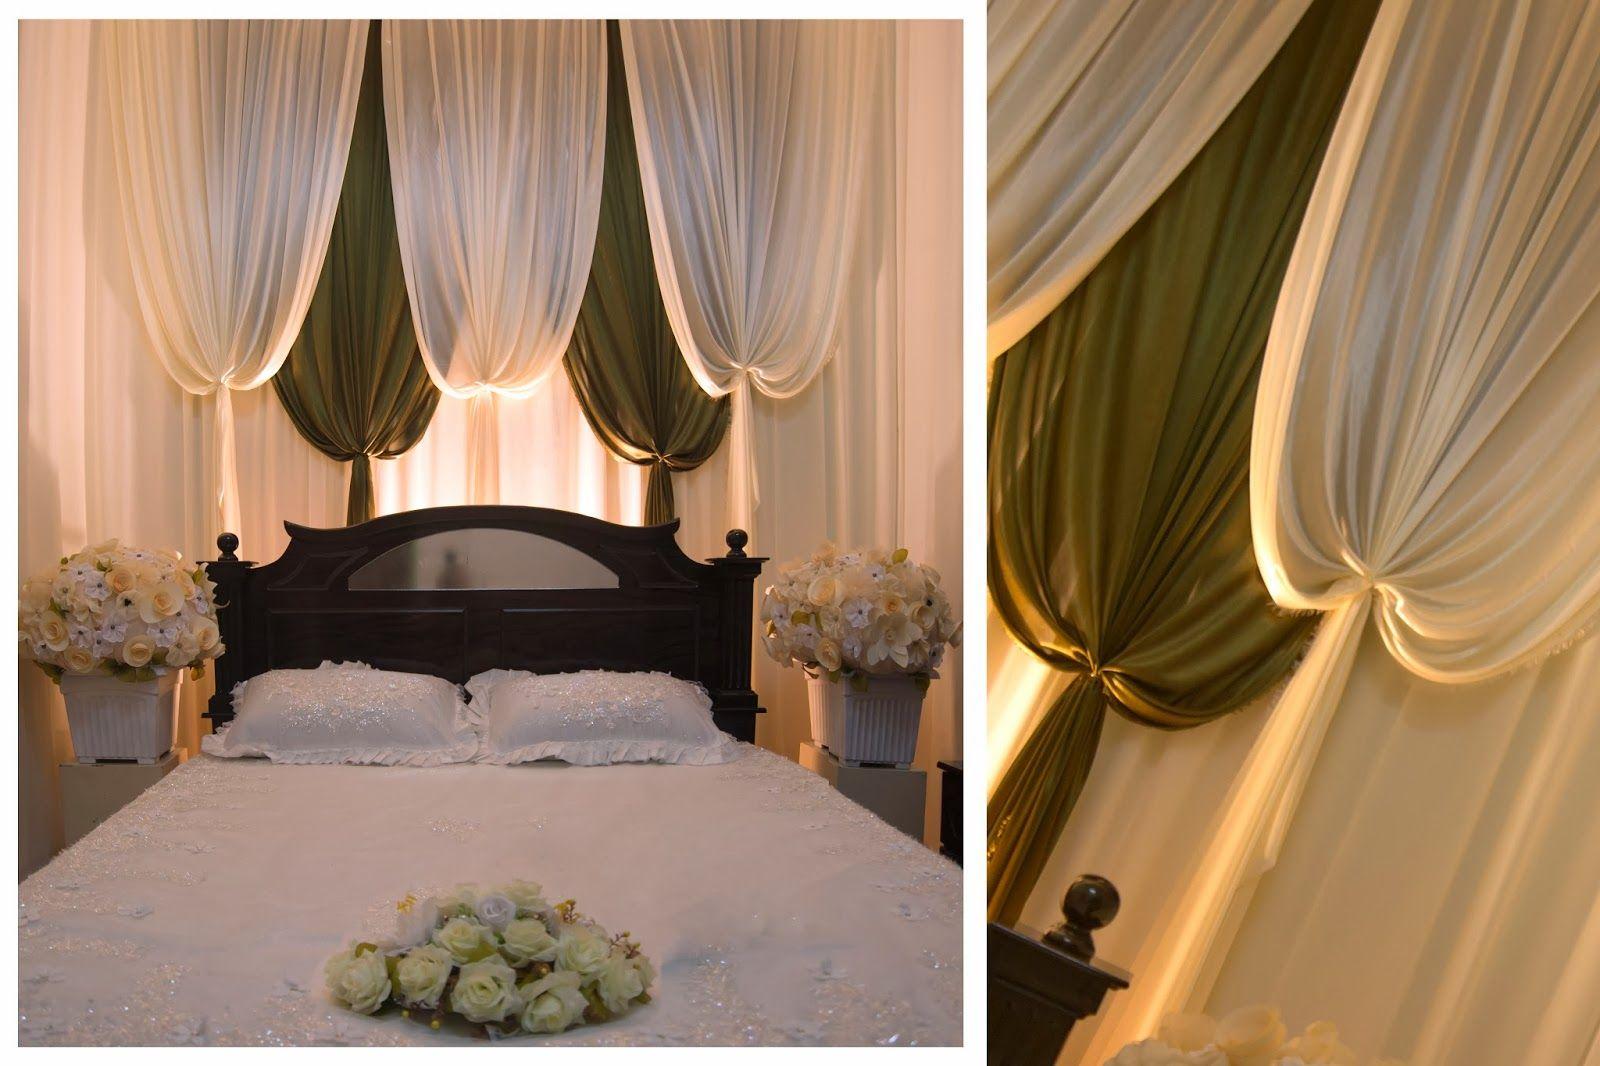 Cadar Bilik Pengantin Google Search Bridal Room Pinterest Wedding Weddings And Stuff